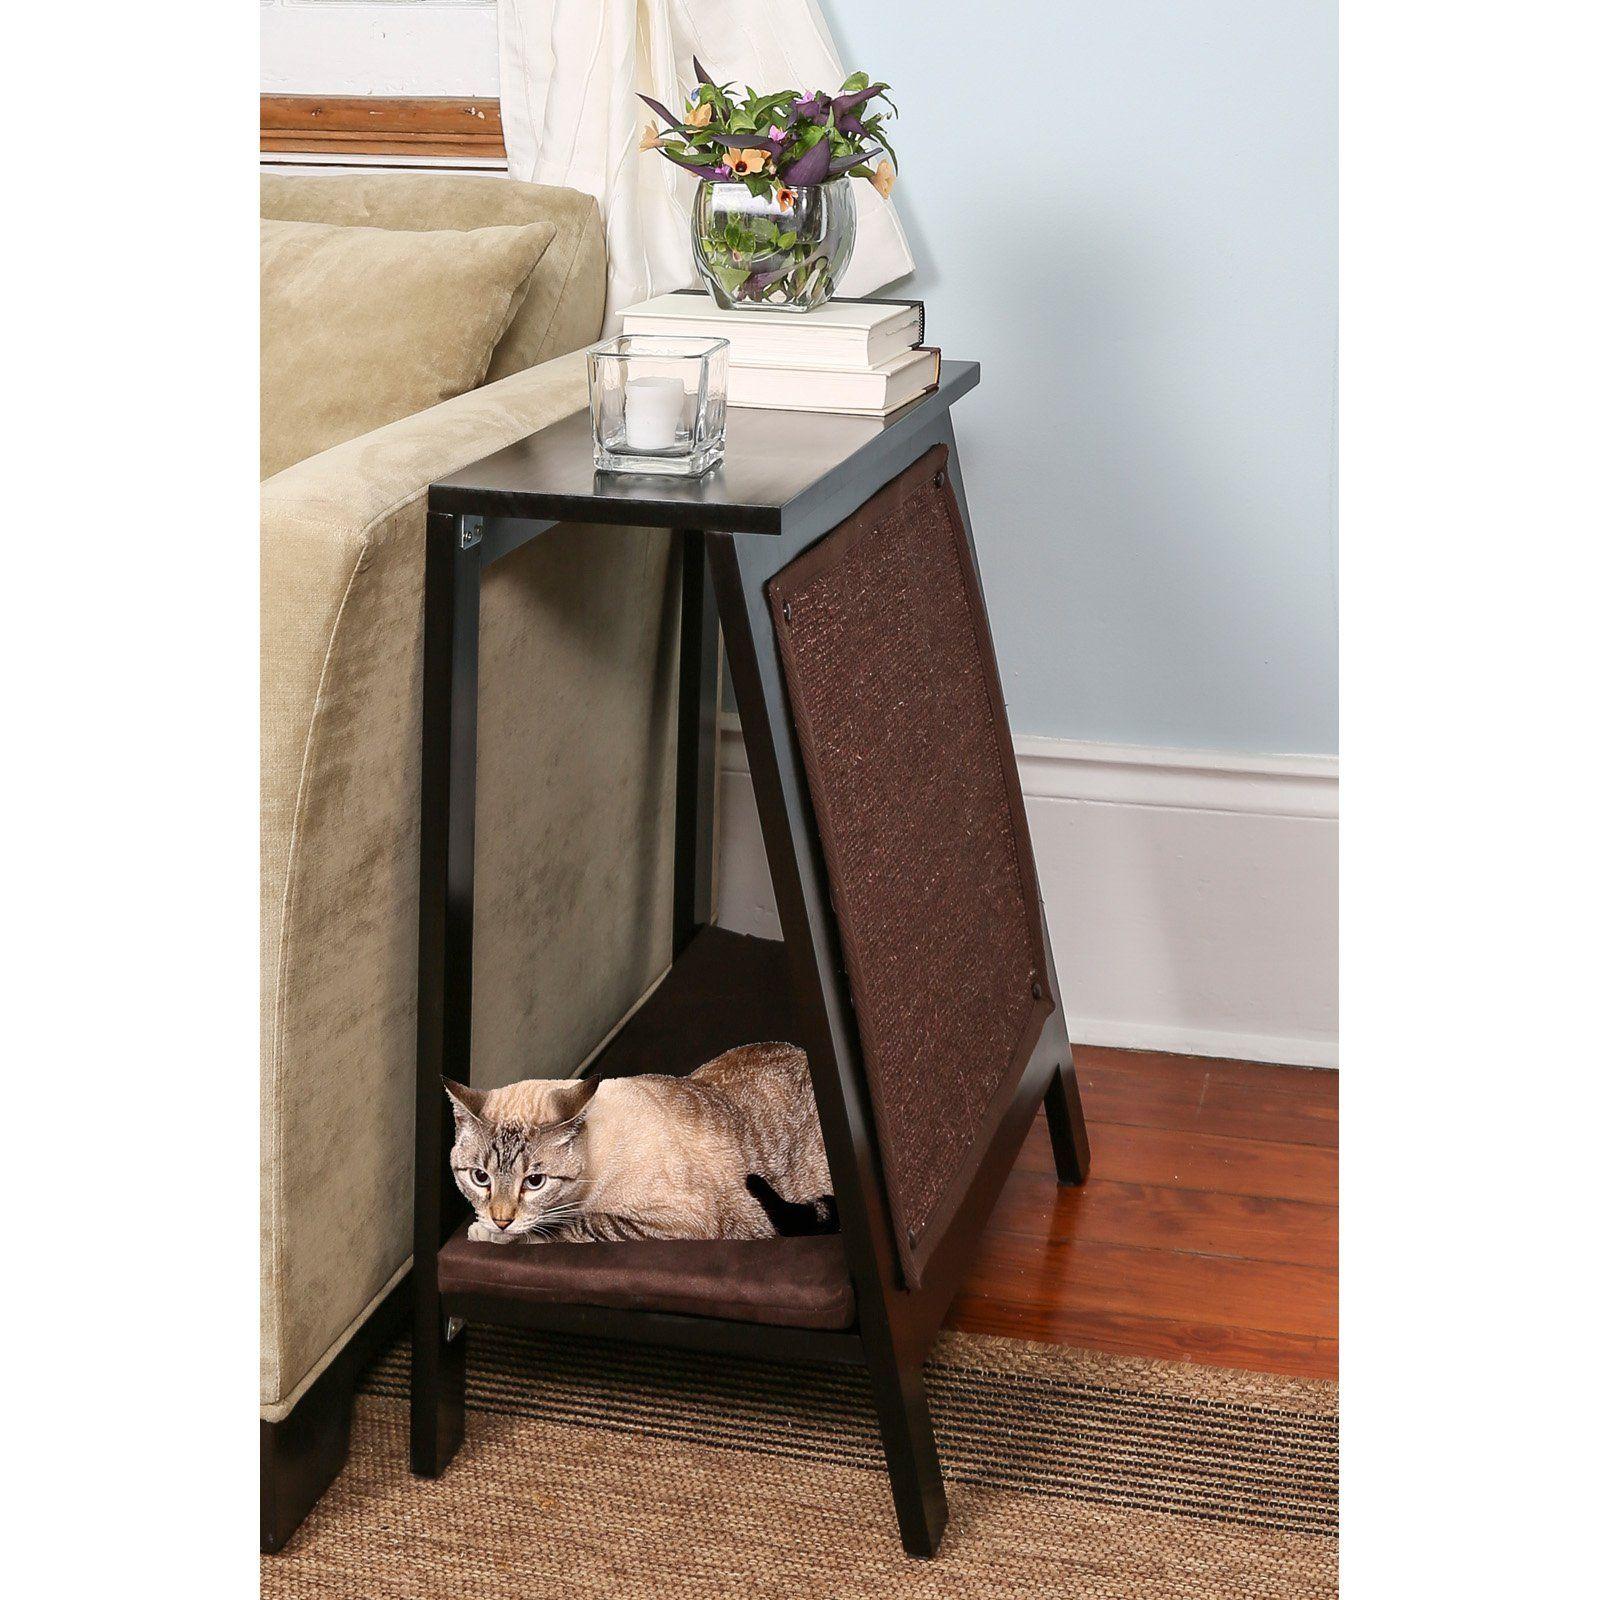 Refined Feline AFrame Cat Bed Pet furniture, Cat